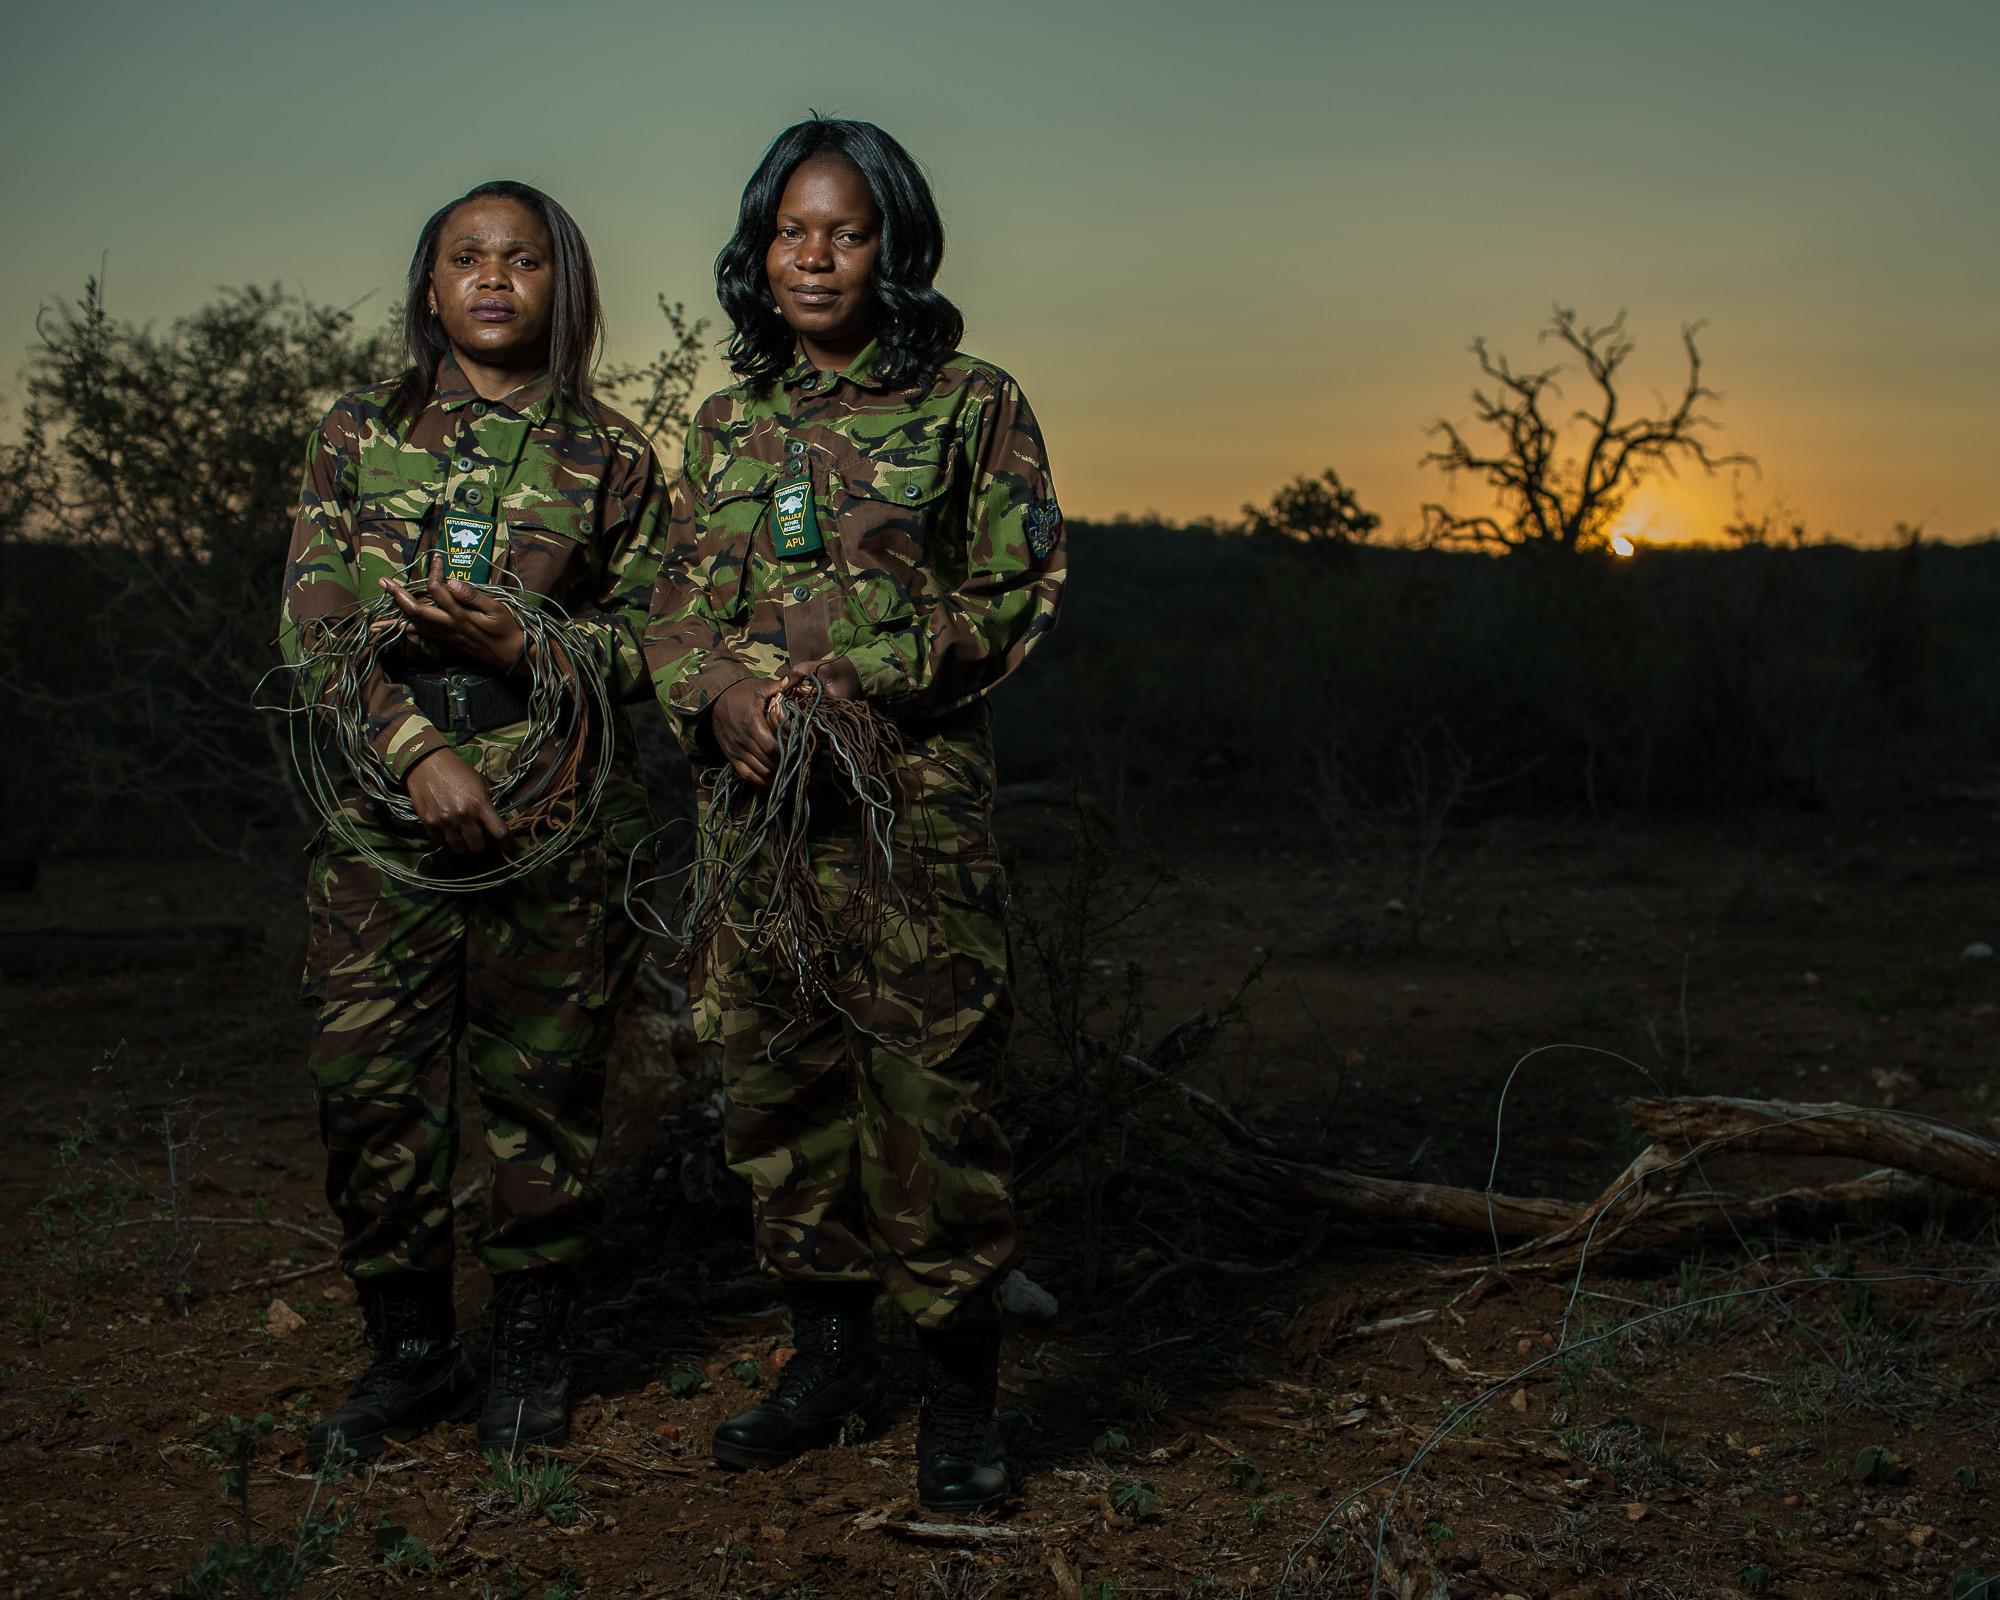 Lukie Mahlake and Winny Nyathi, members of the Black Mamba anti-poaching unit in Balule Game Reserve.